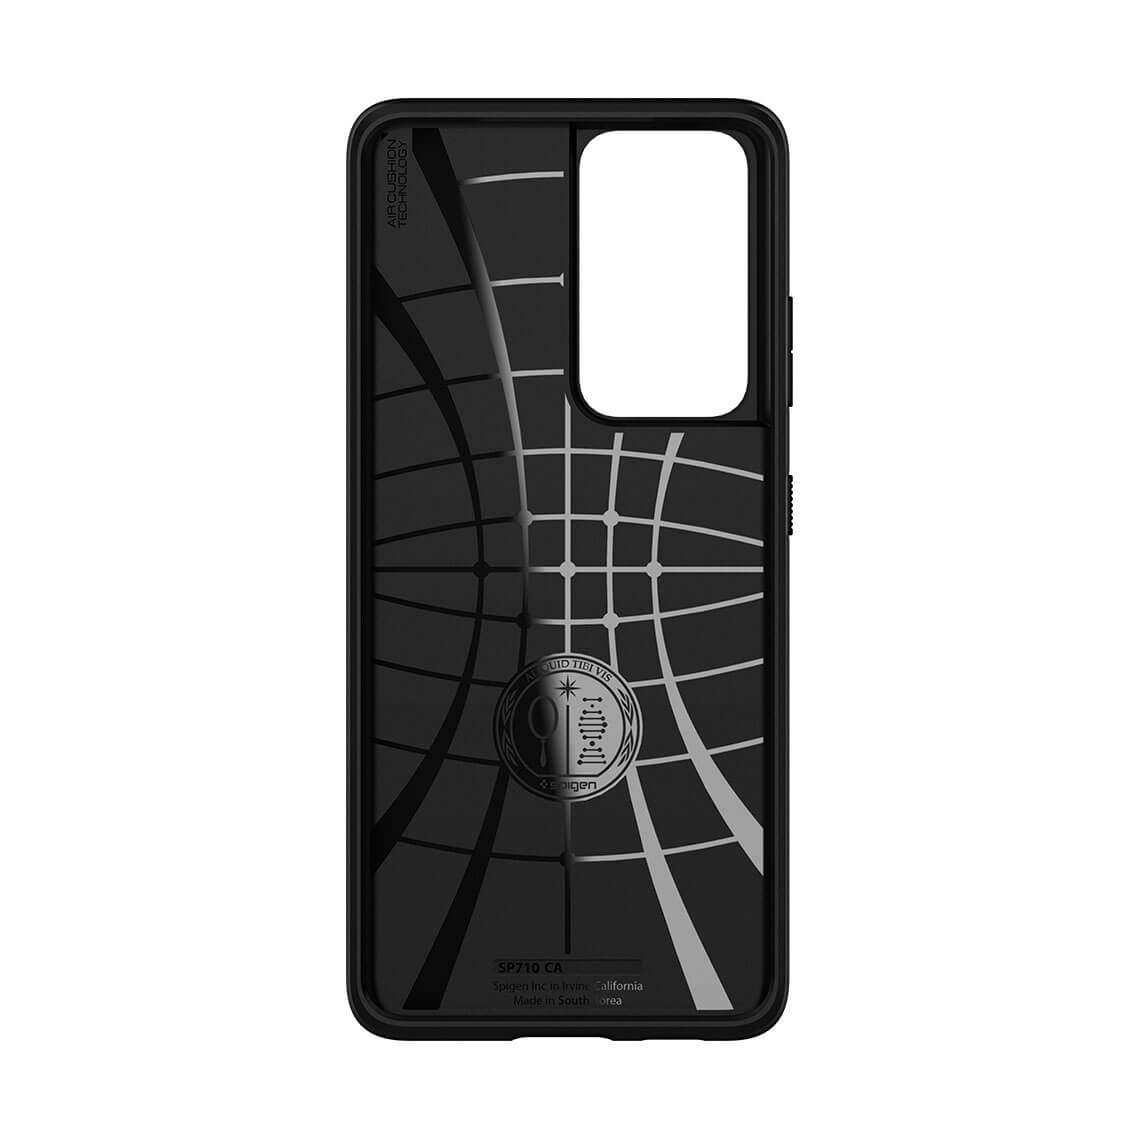 قاب اسپیگن Core Armor سامسونگ Galaxy S21 Ultra